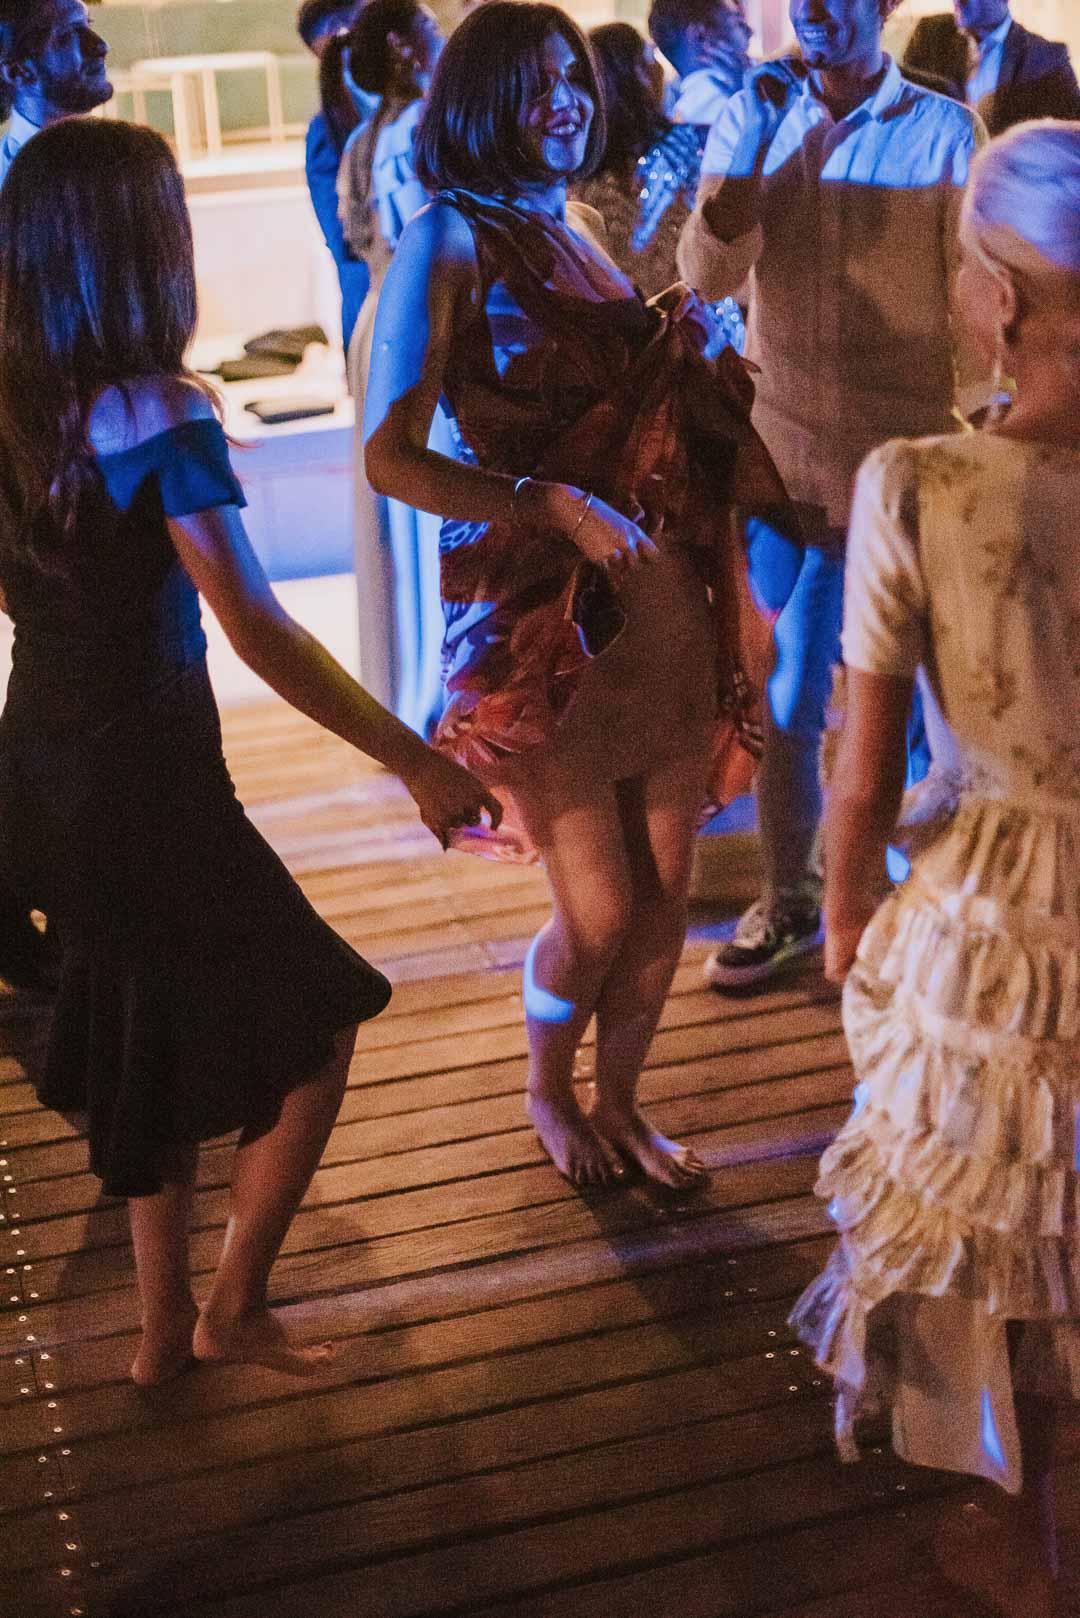 wedding-photographer-destination-fineart-bespoke-reportage-napoli-nabilah-vivianeizzo-spazio46-204